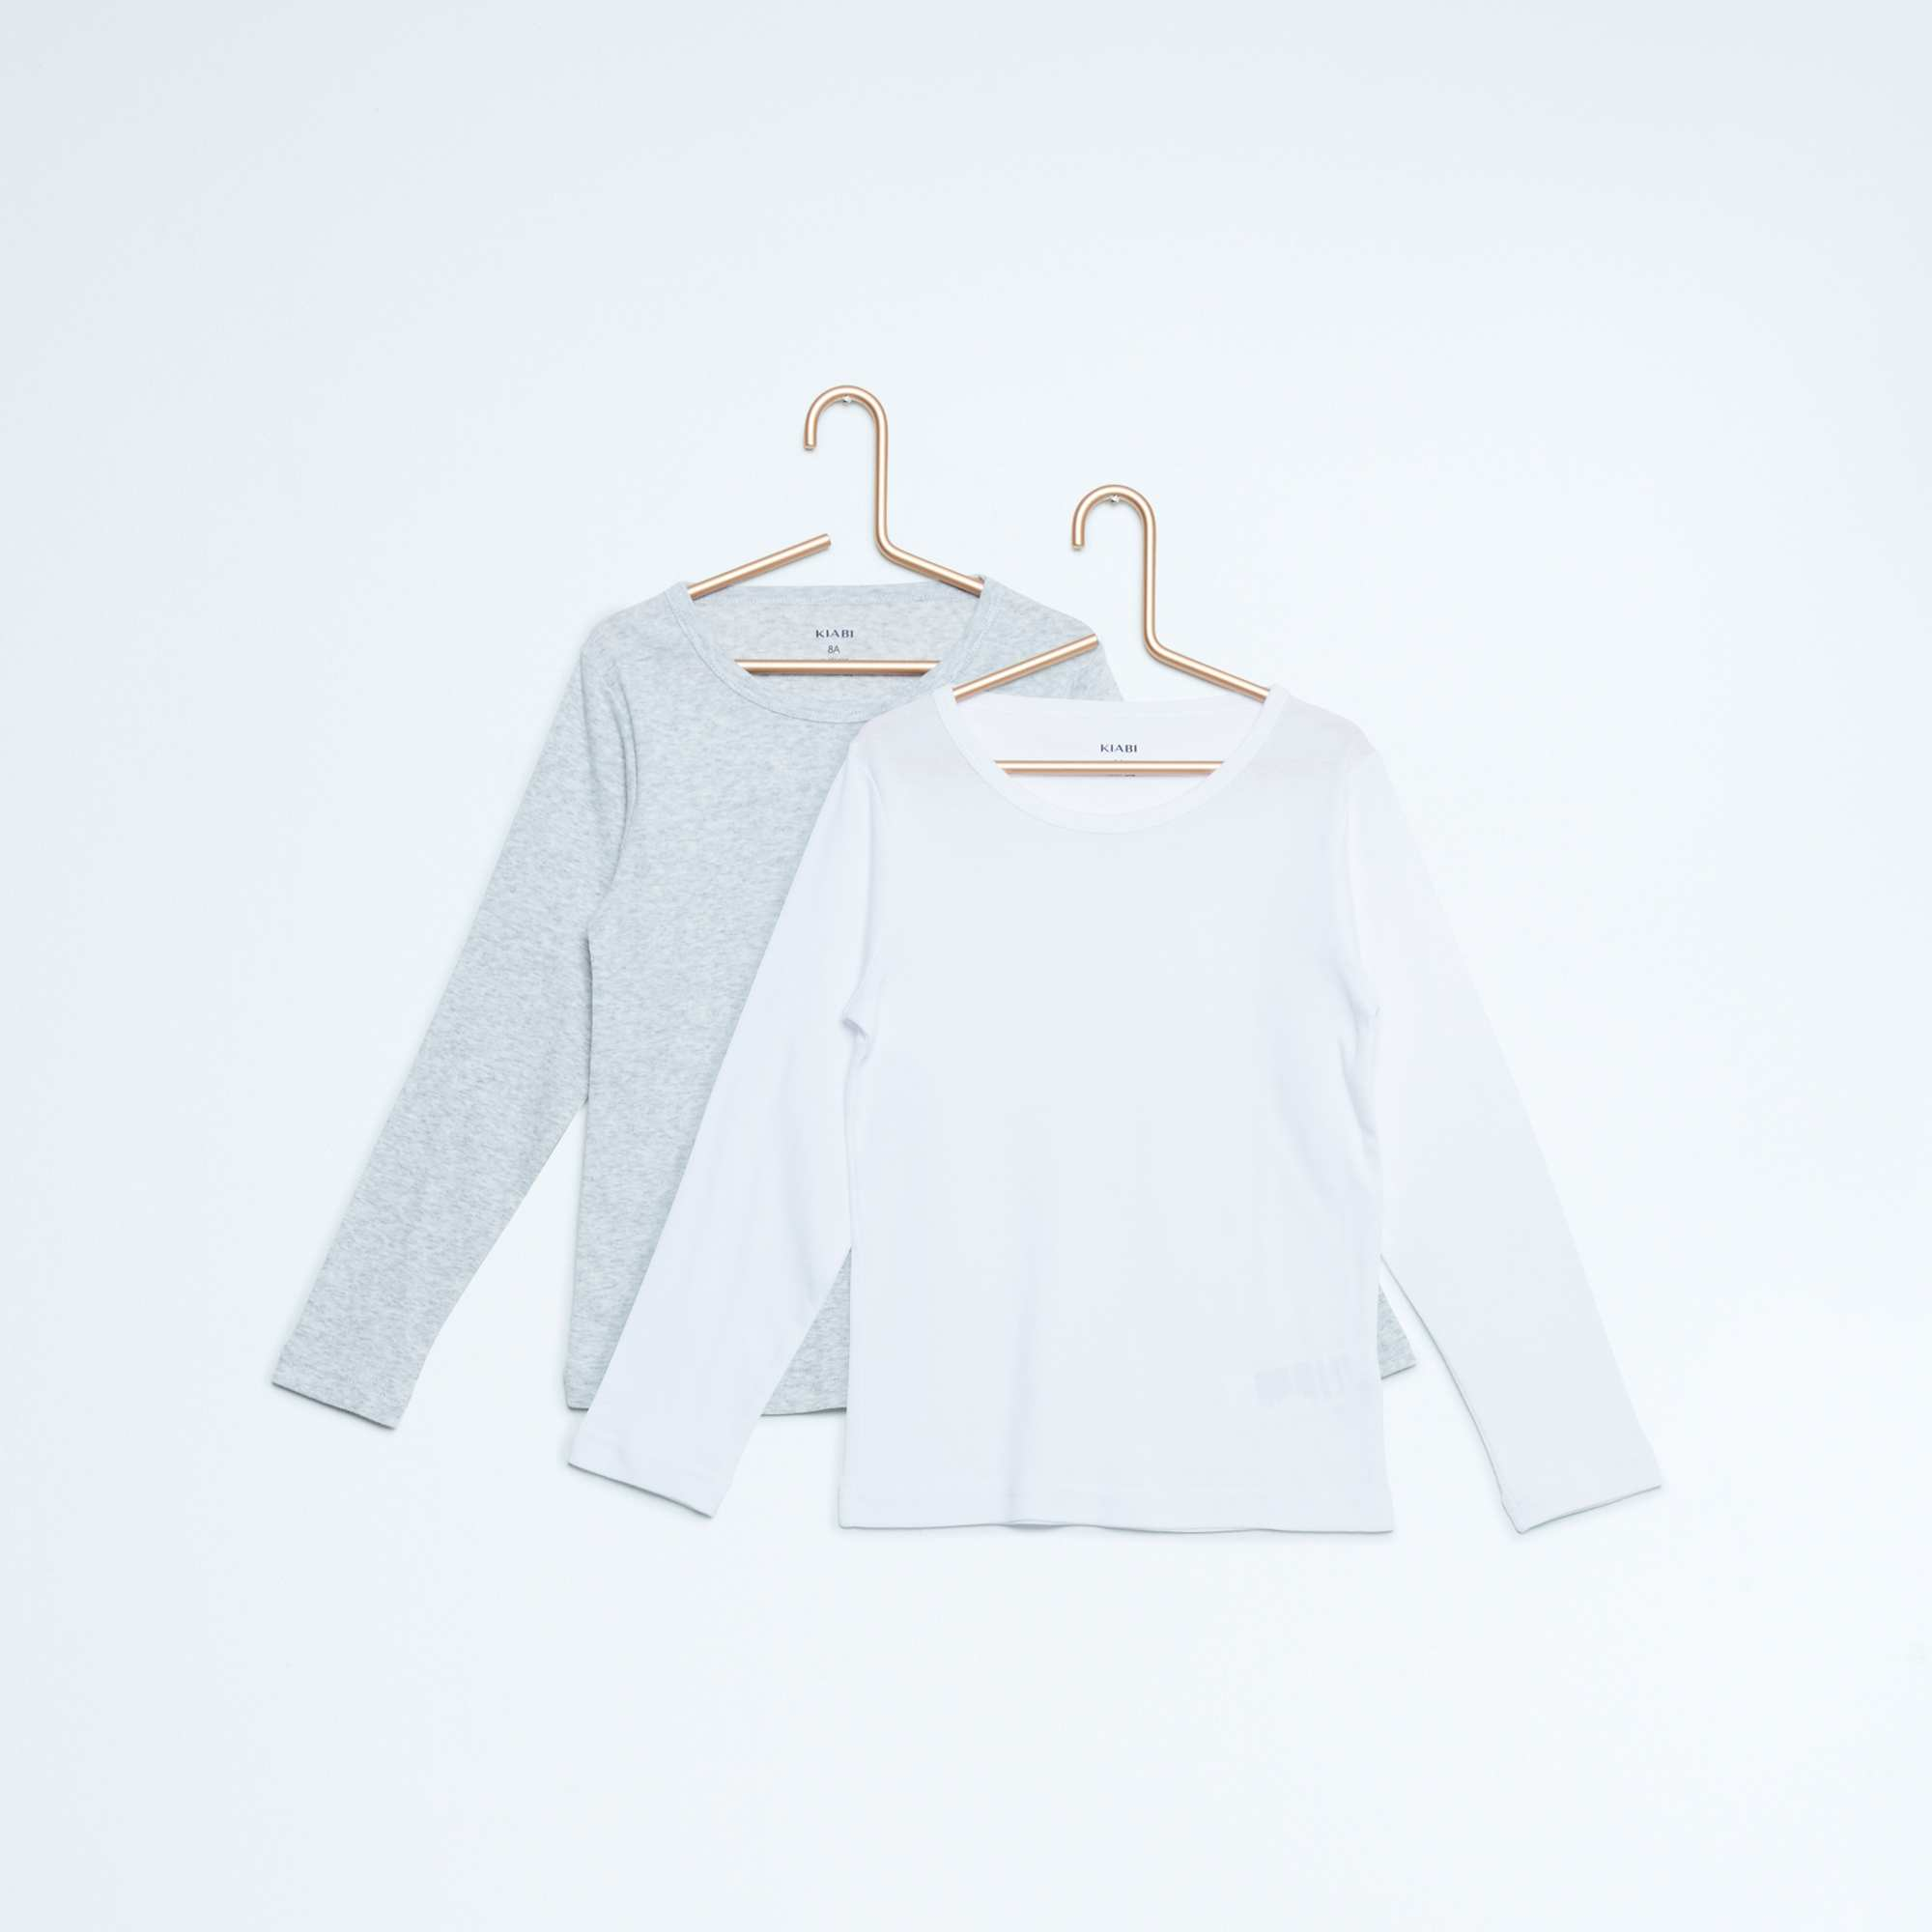 lot de 2 maillots de corps en coton gar on kiabi 5 60. Black Bedroom Furniture Sets. Home Design Ideas